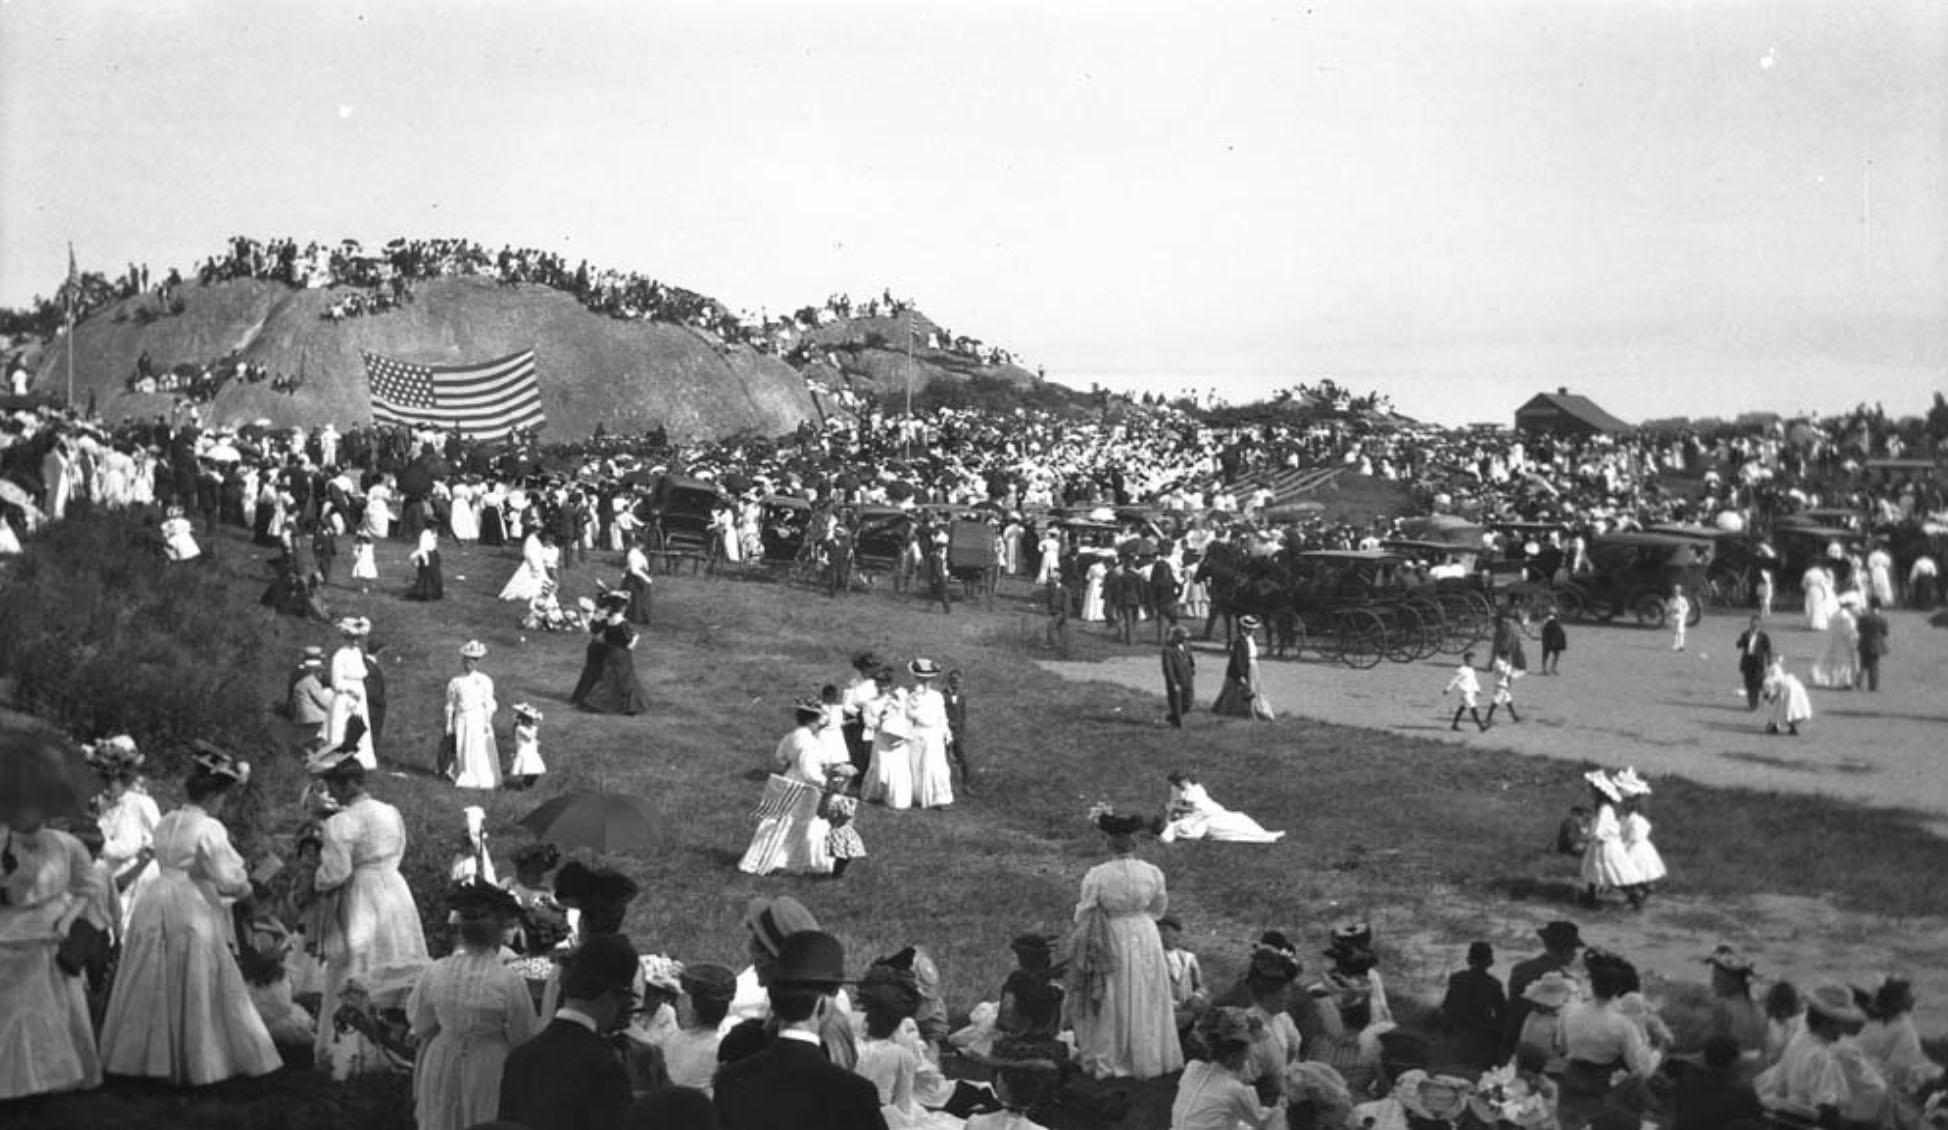 Dedication of Tablet Rock at Stage Fort Park. August 1907